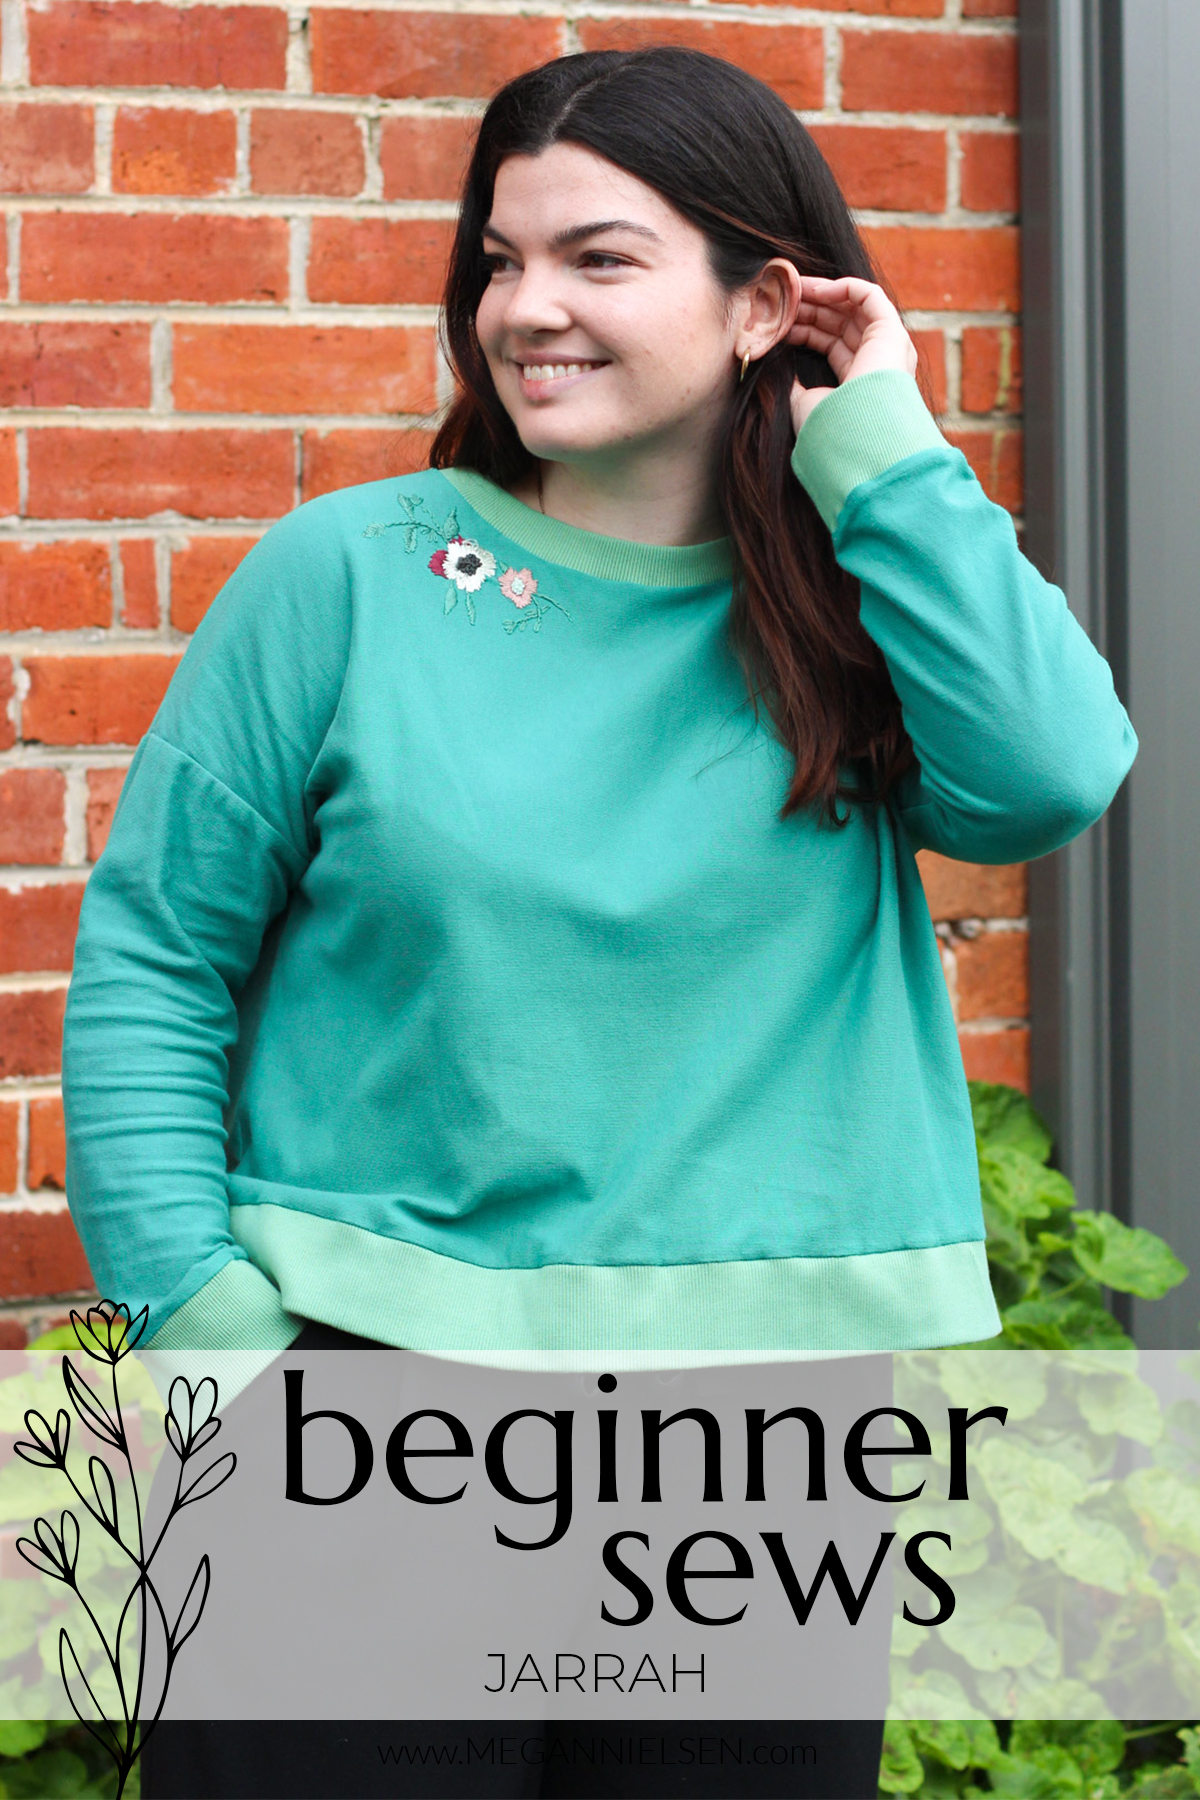 Jarrah Beginner Sews